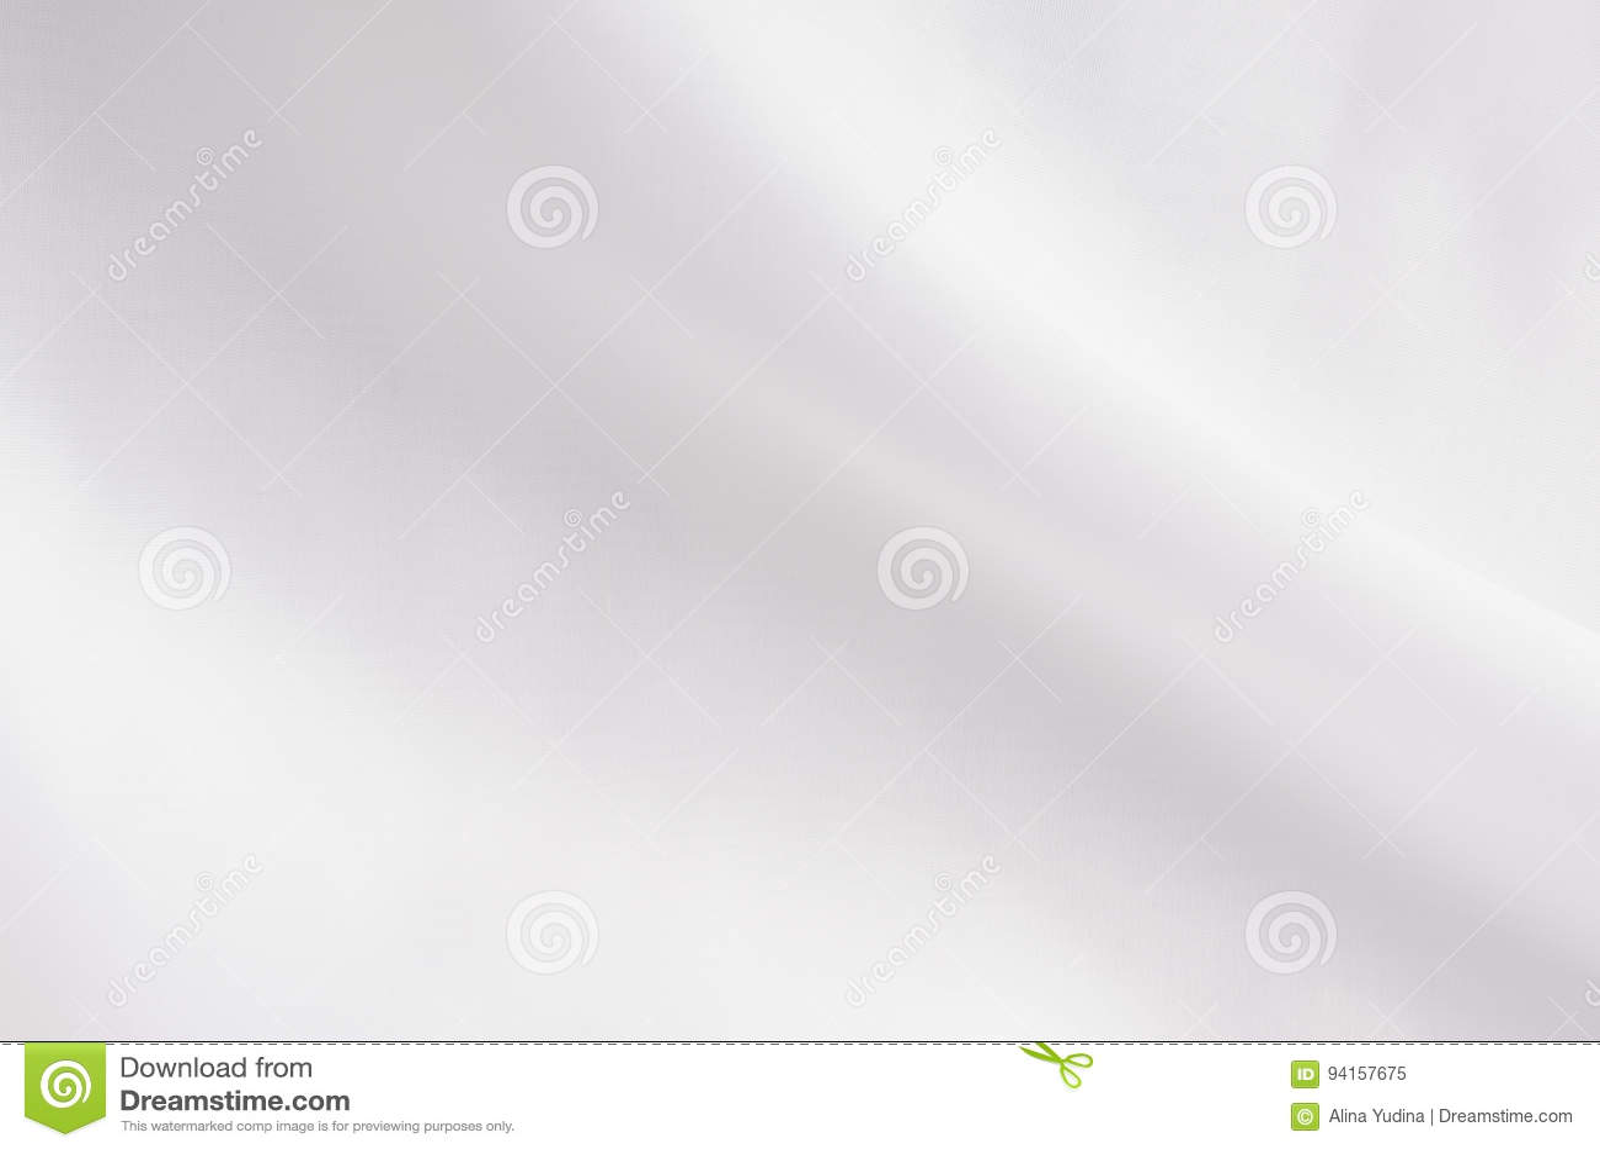 Textura elegante lisa blanca de la seda o de la tela de satén con la onda líquida